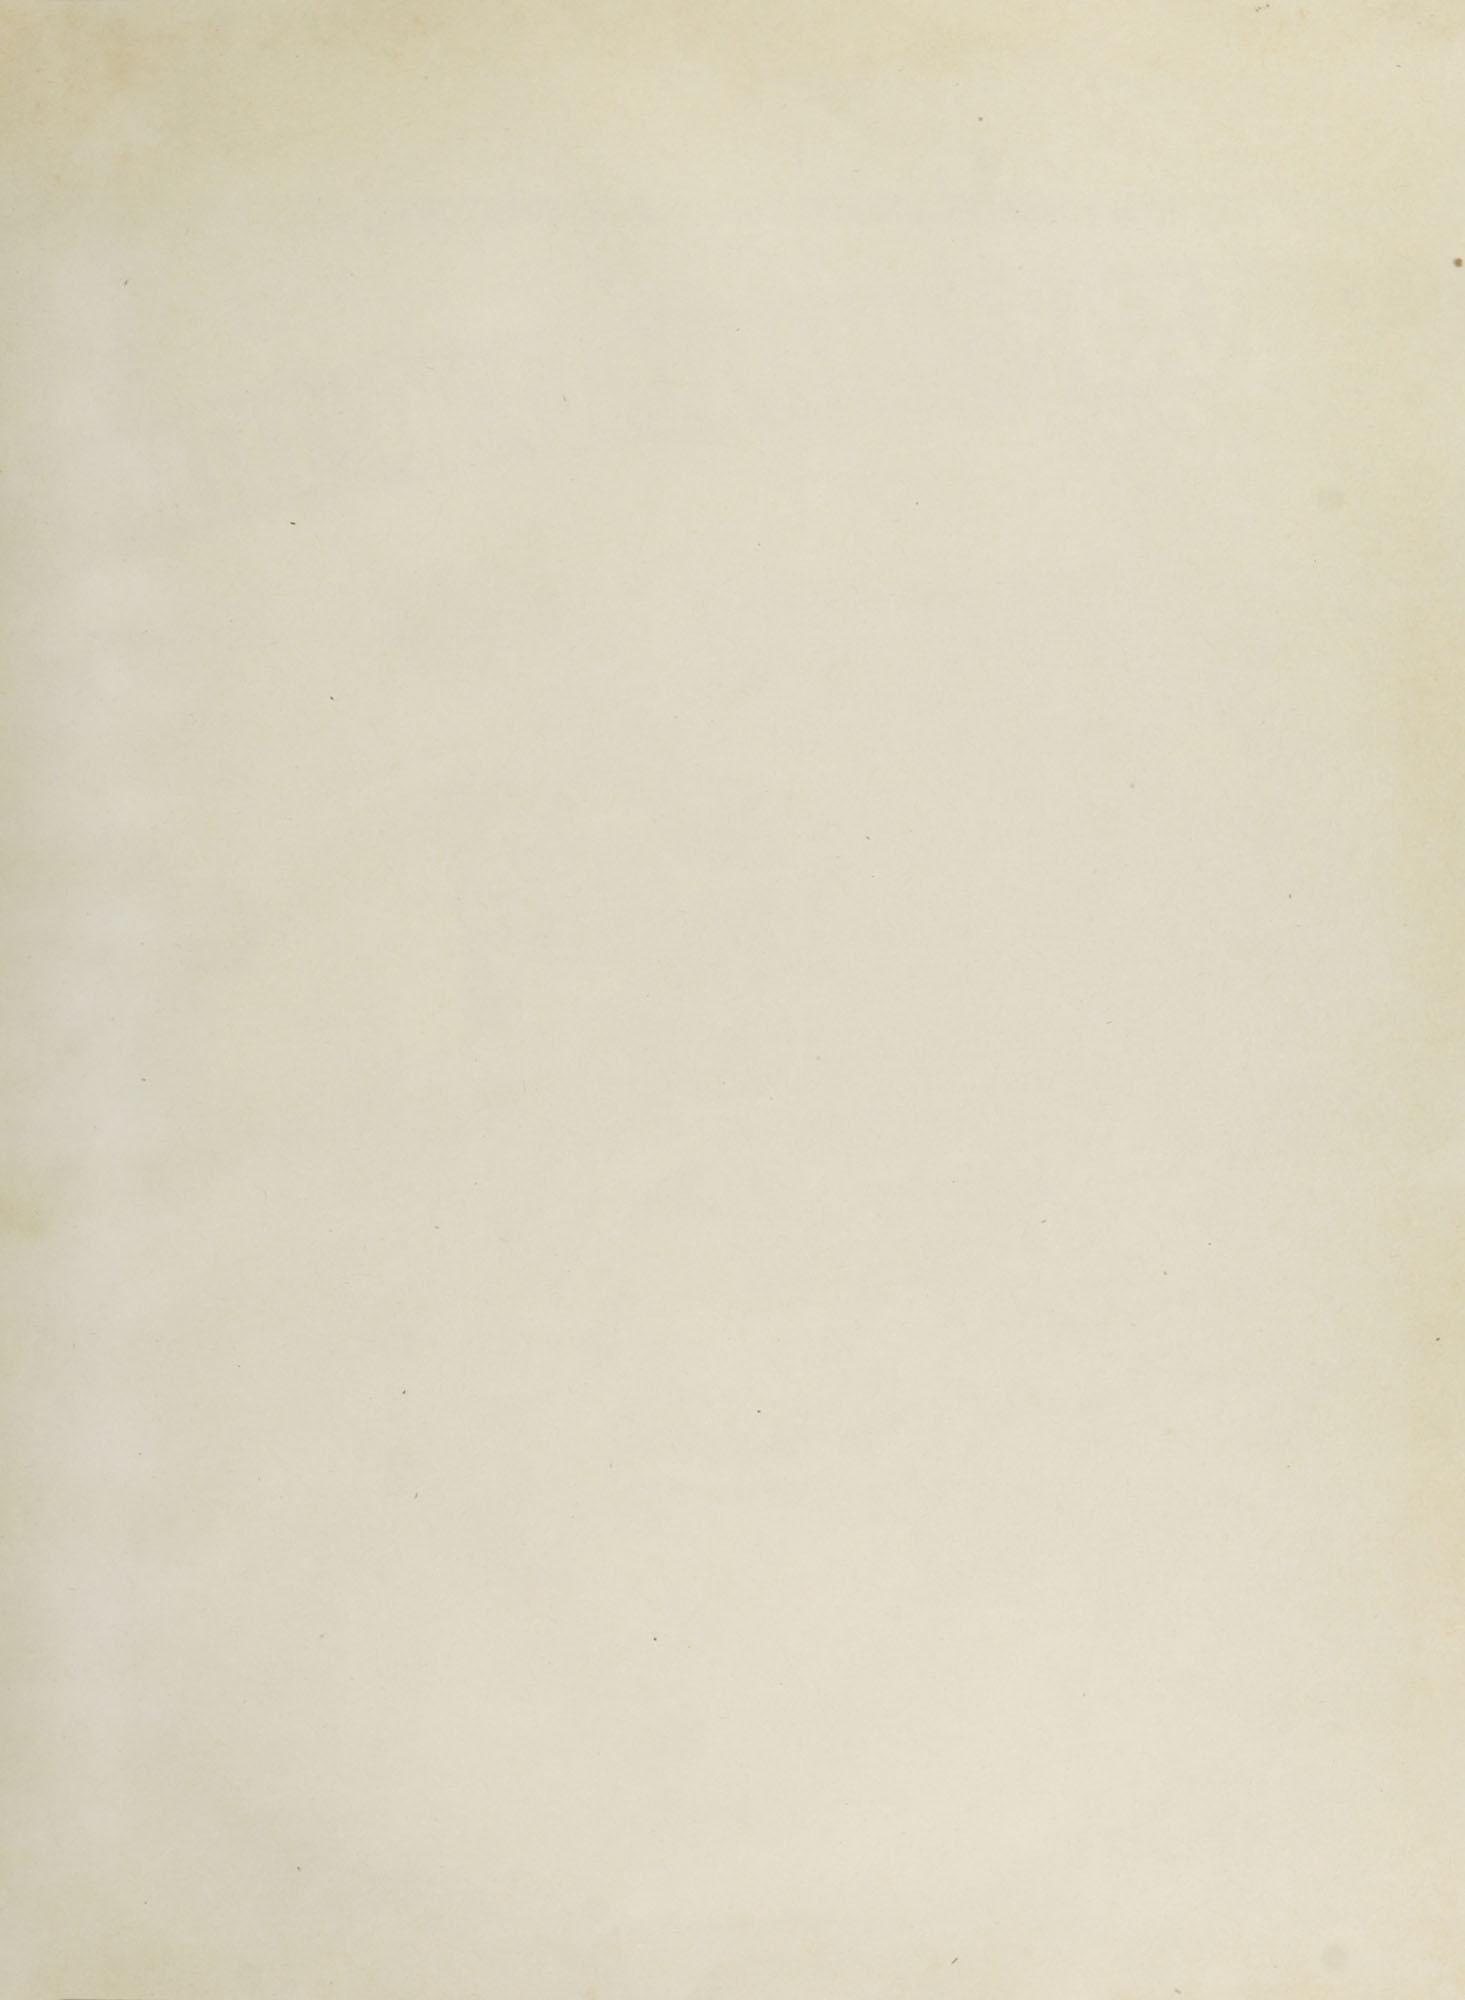 College of Charleston Magazine, 1938-1939, blank page